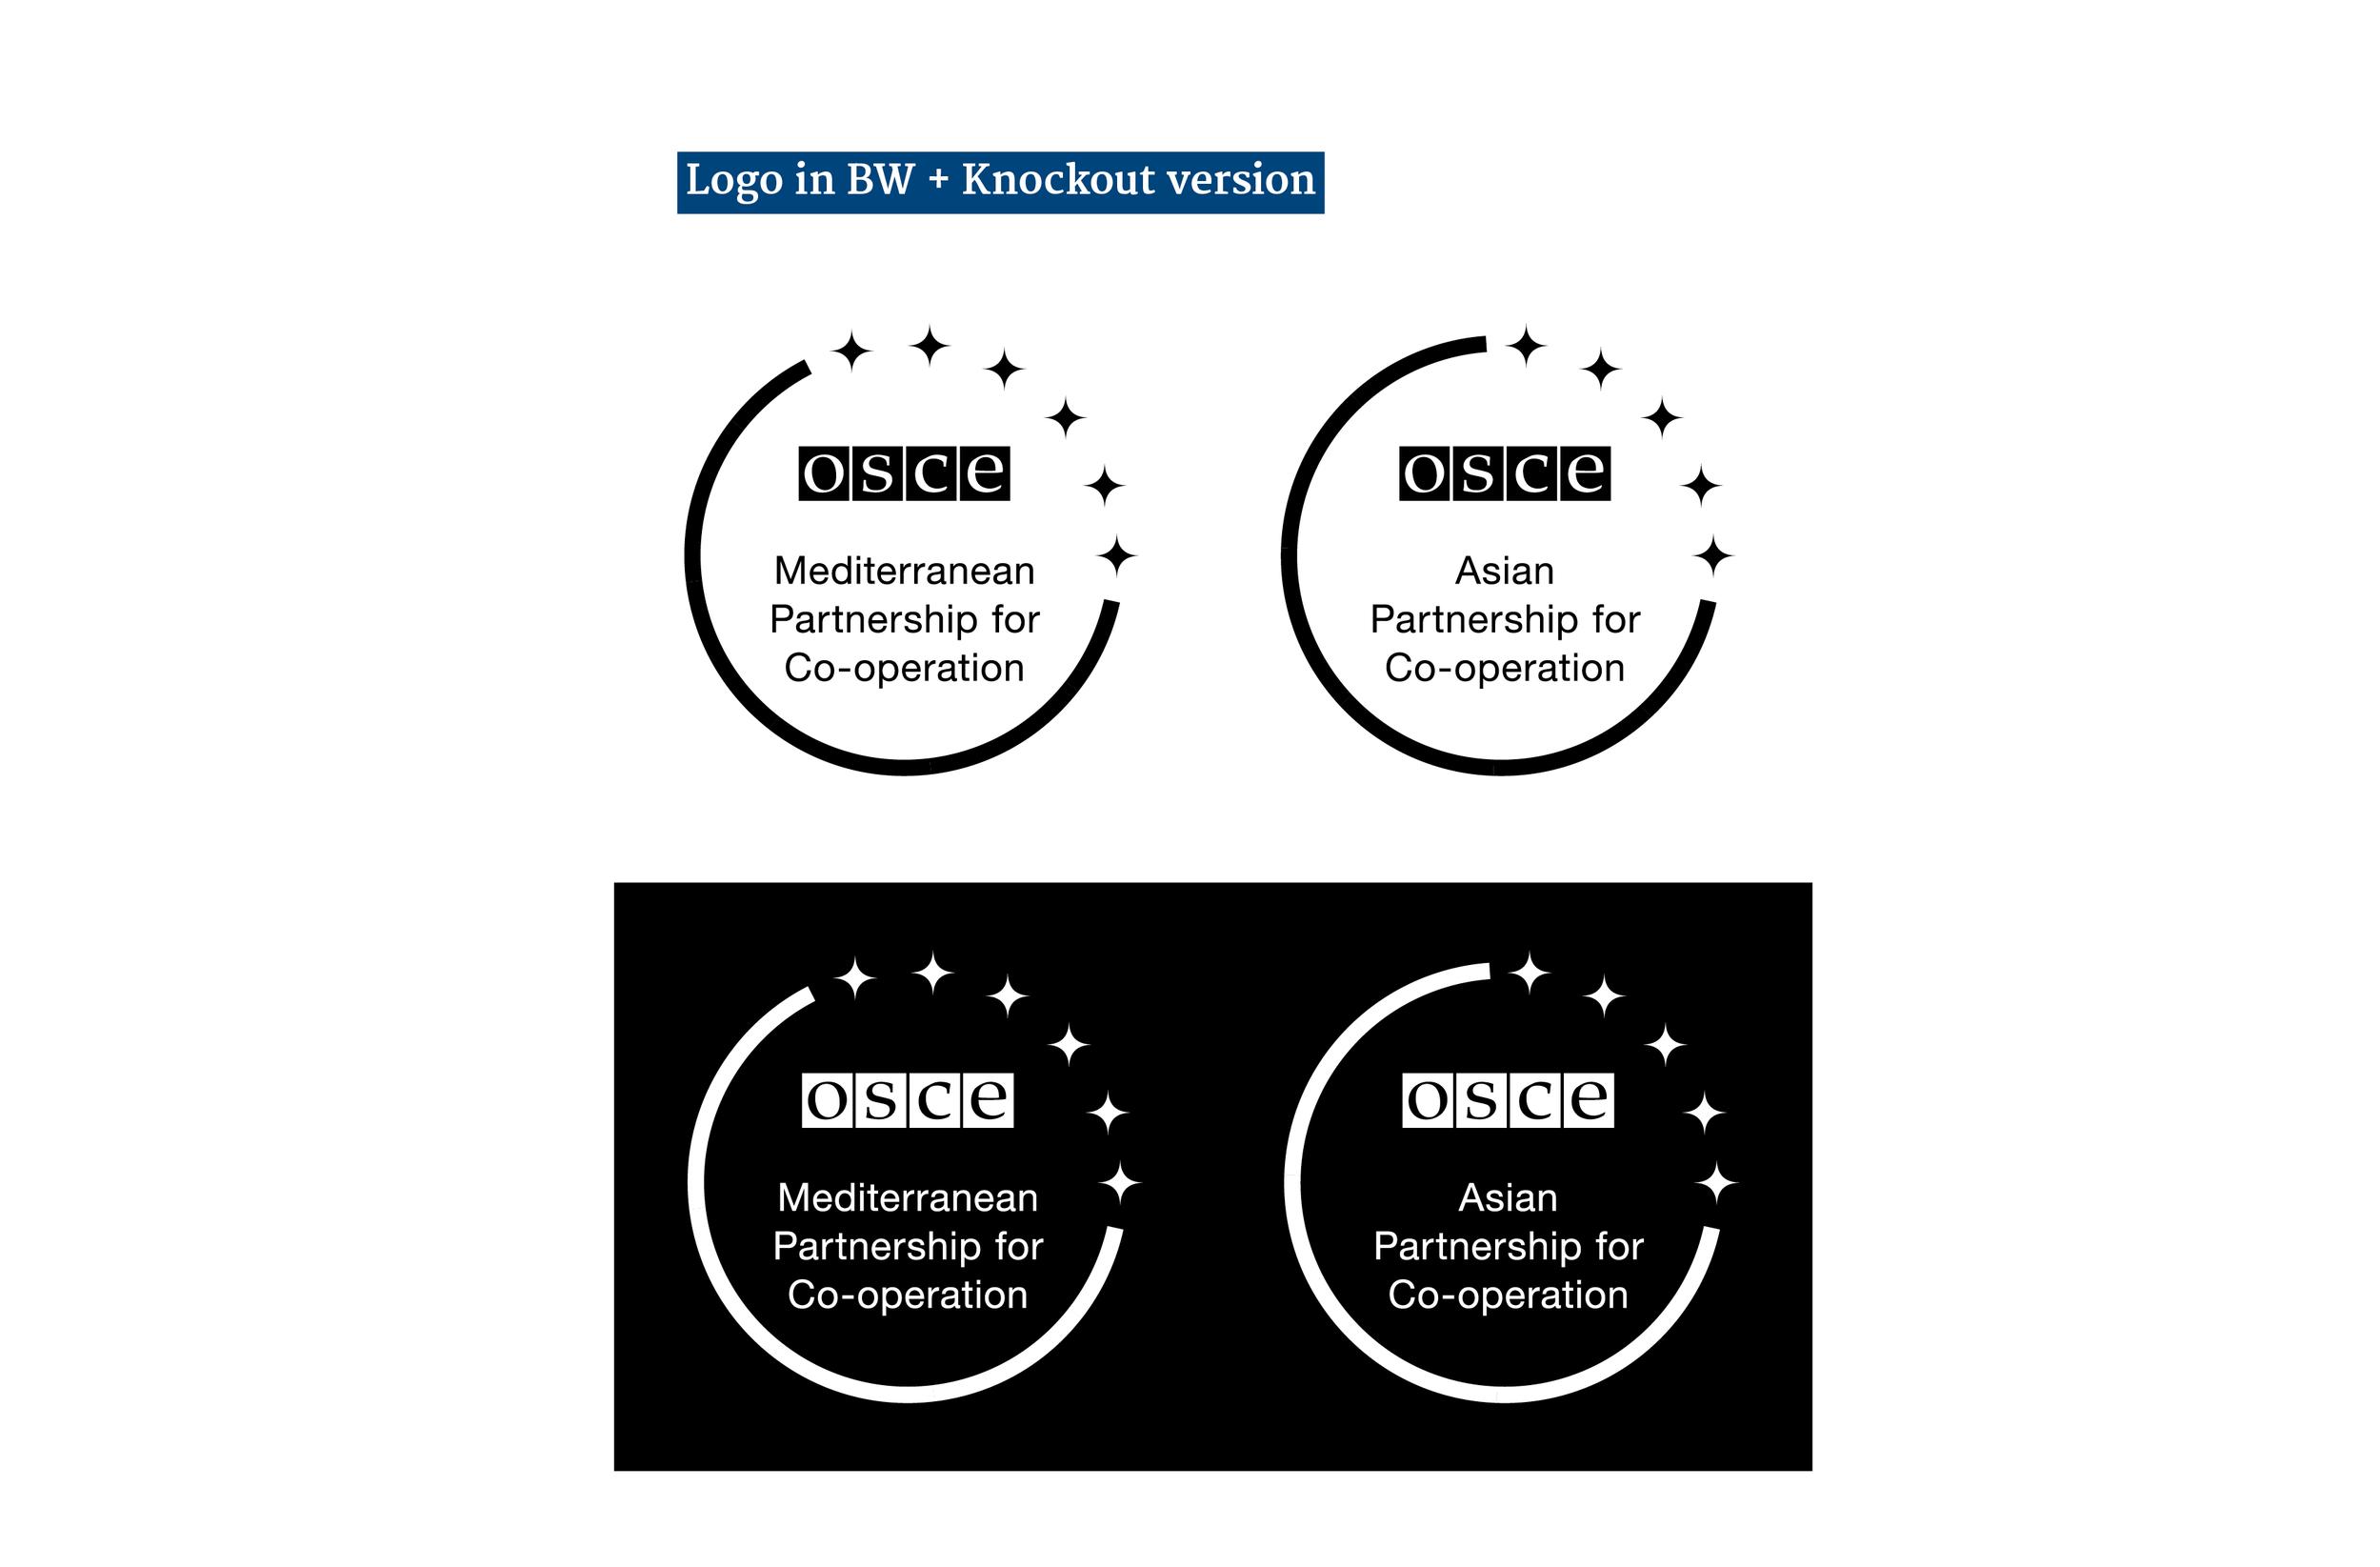 OSCE_Partnership_Logo_Graphic_Charter_31101610.png